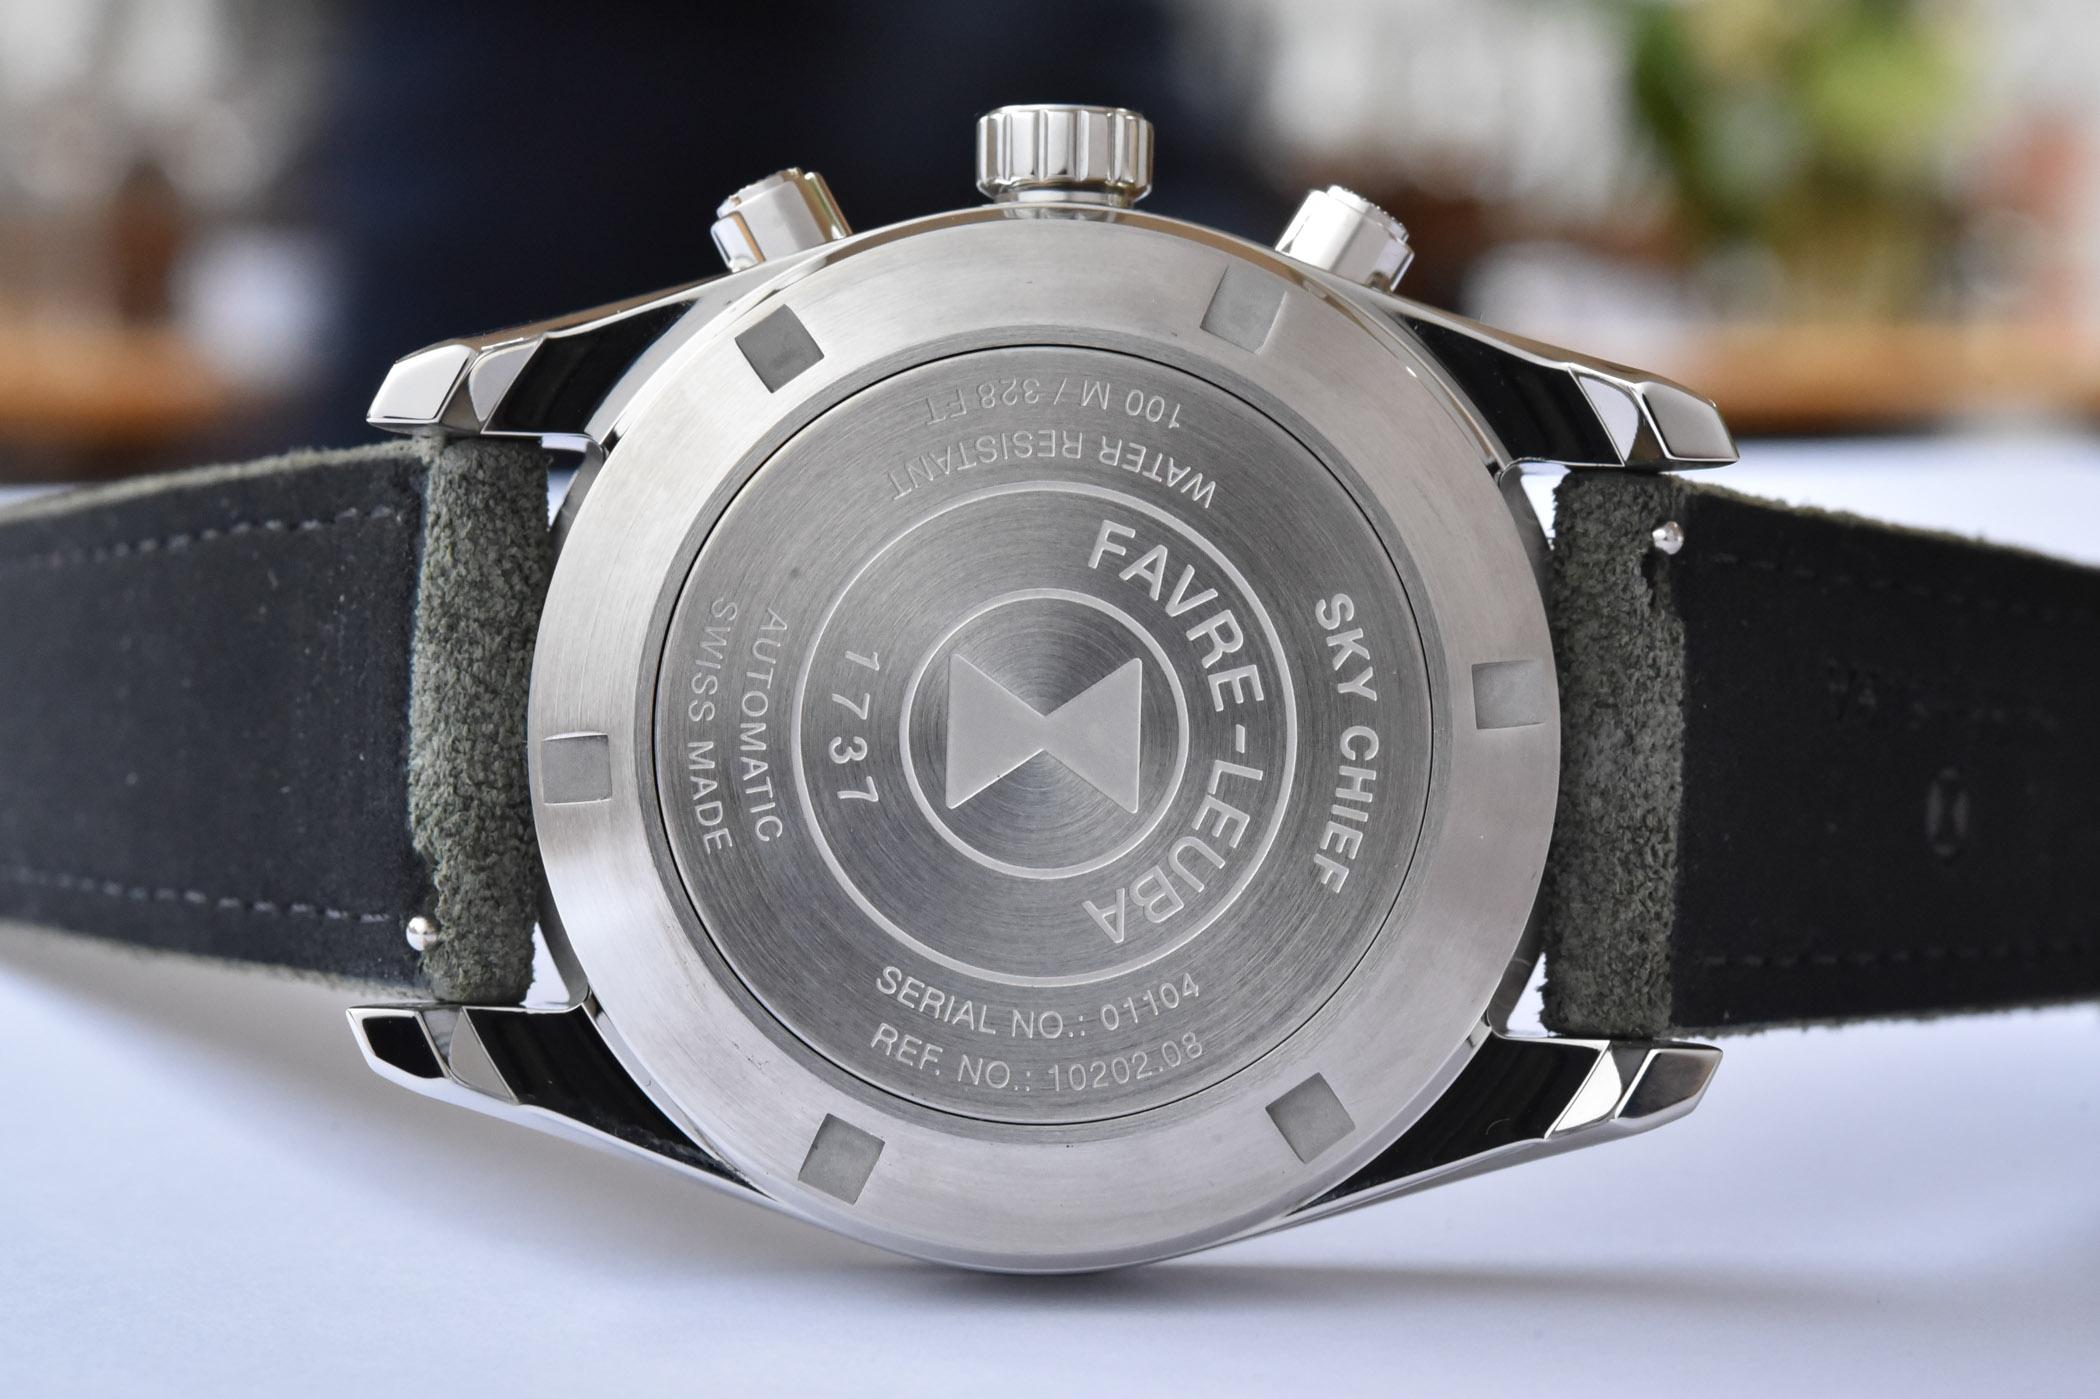 Favre-Leuba Sky Chief Chronograph 43mm Collection 2020 - 3